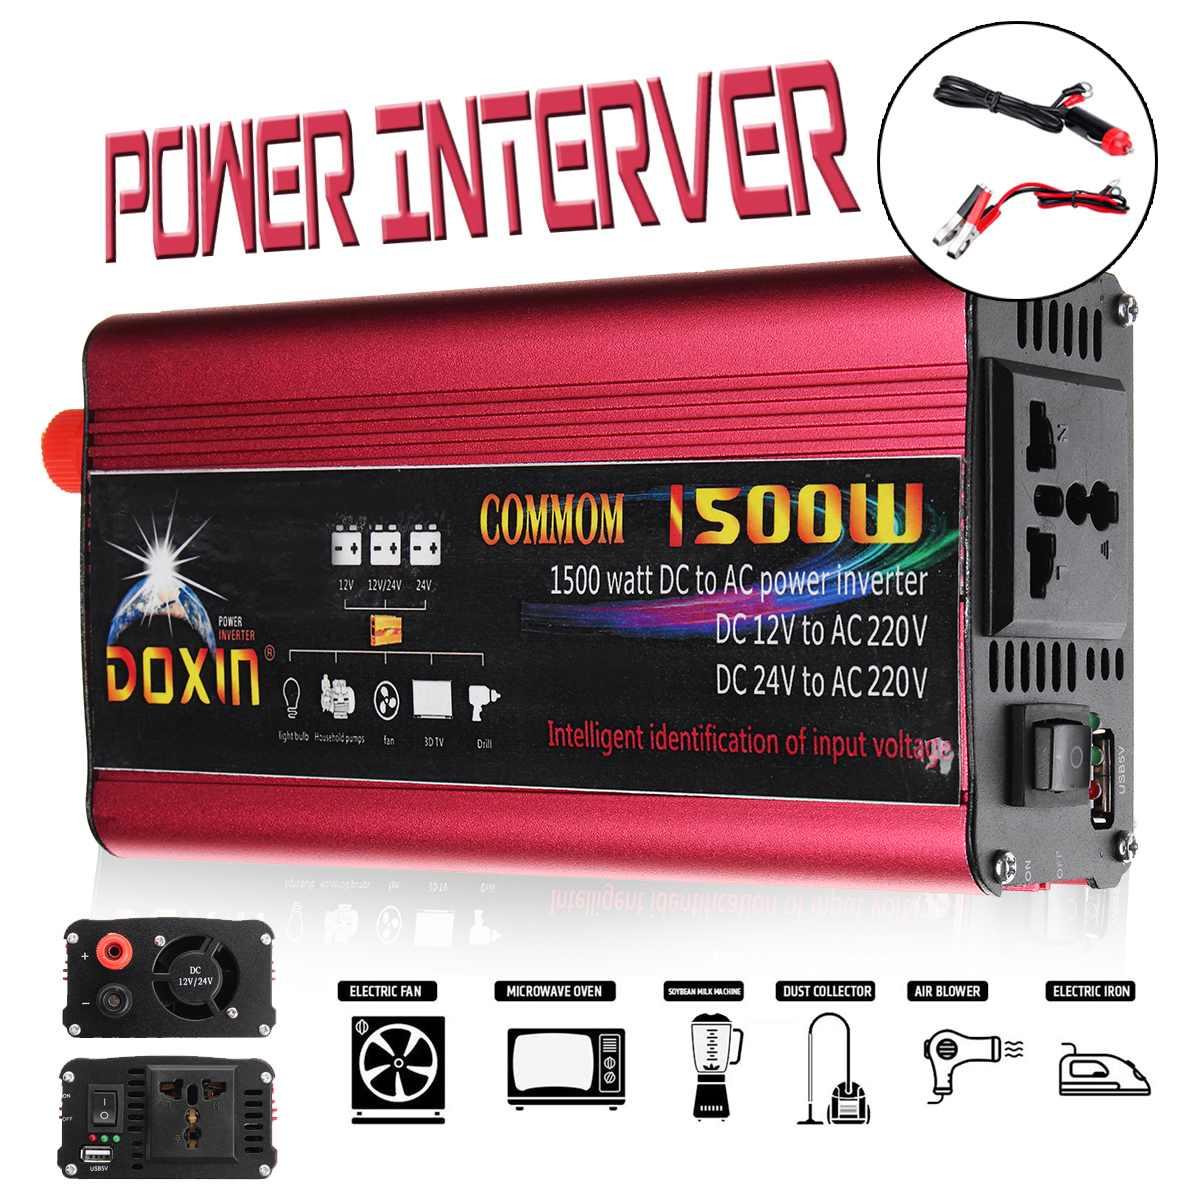 1500w/3000w P eak Power Inverter Converter Car Inverter Charger Adapter DC 12V 24V To AC 220V USB Plug Port Modified Sine Wave1500w/3000w P eak Power Inverter Converter Car Inverter Charger Adapter DC 12V 24V To AC 220V USB Plug Port Modified Sine Wave